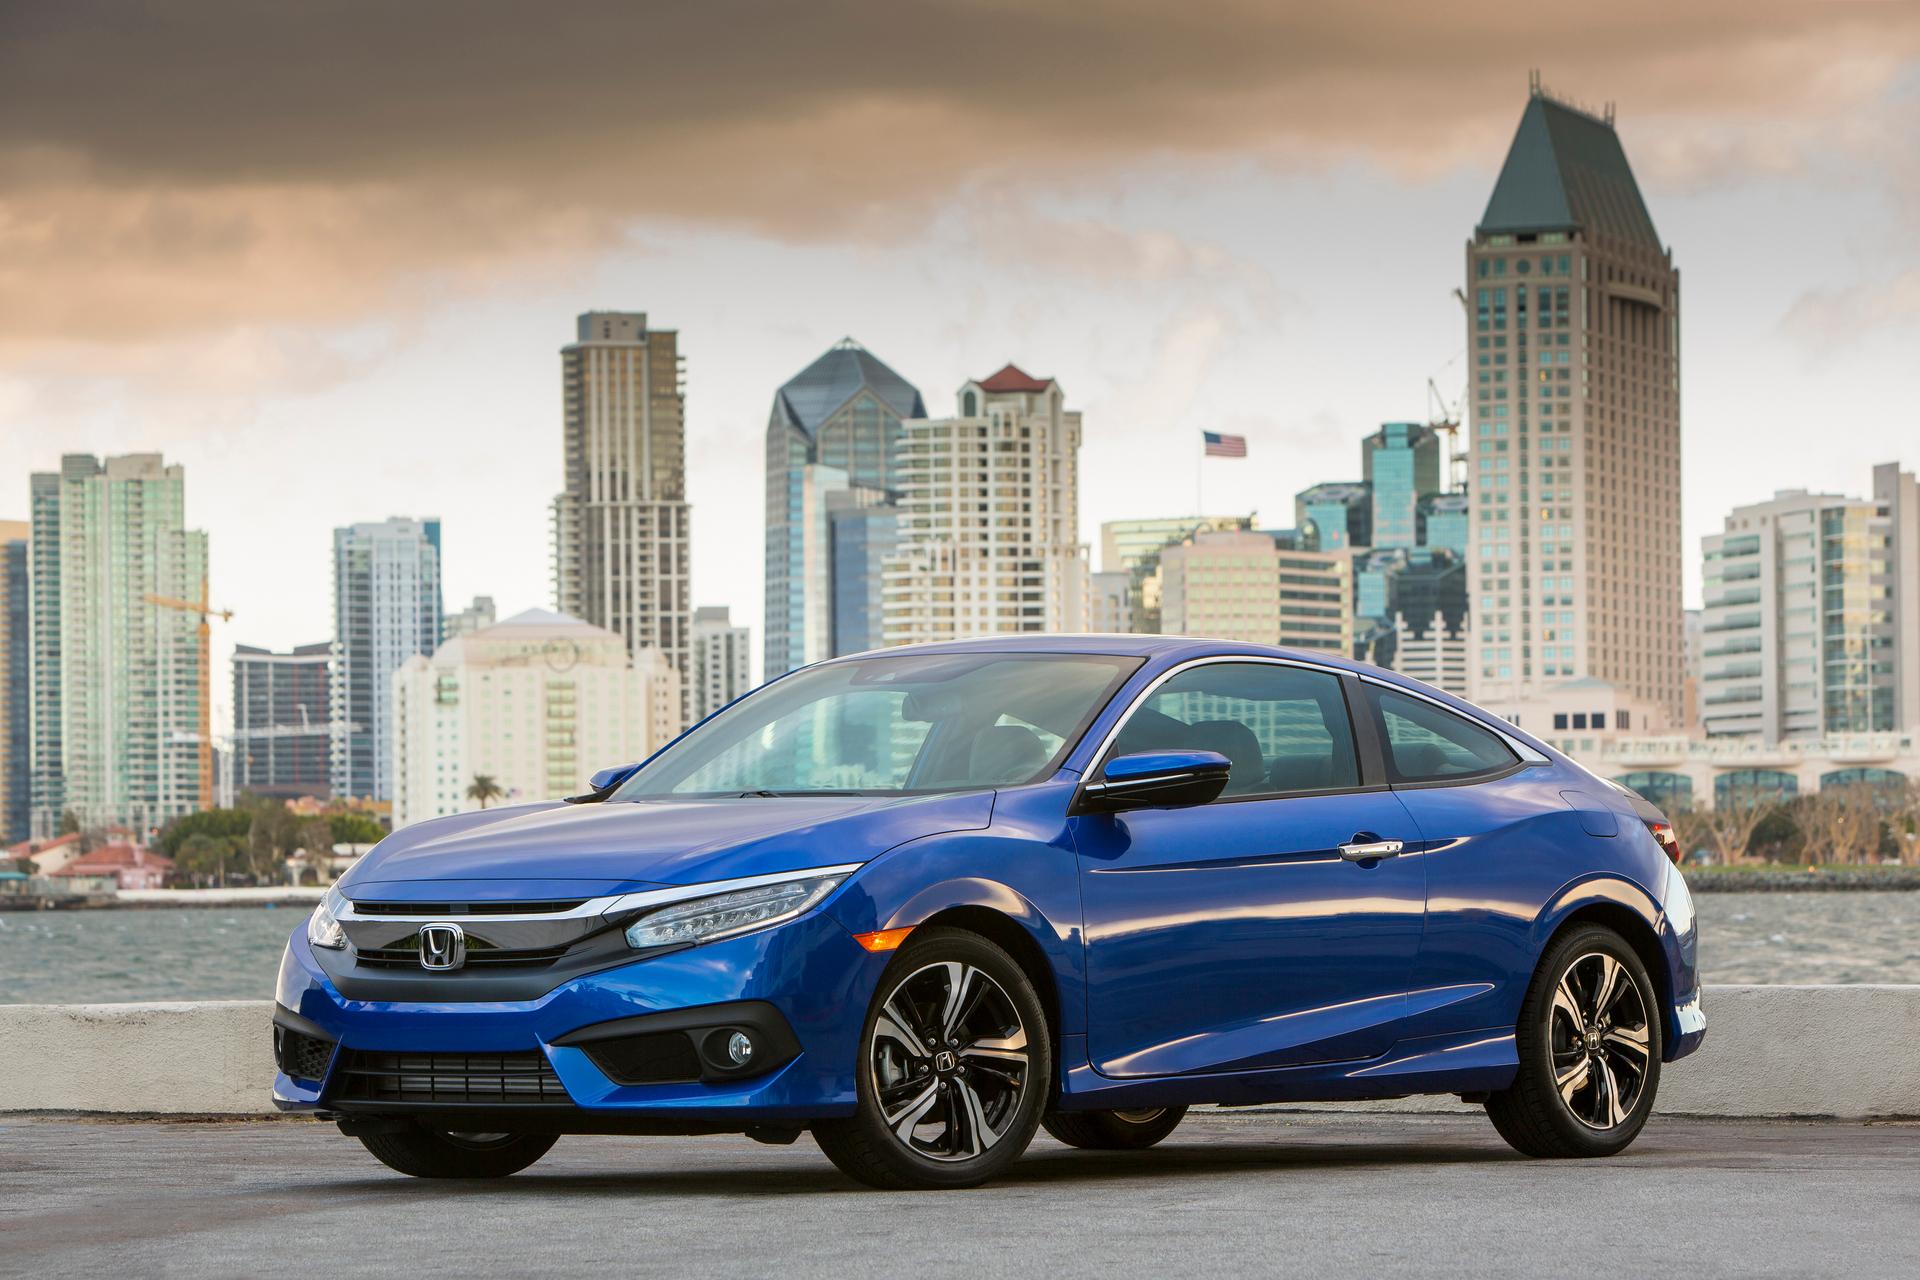 2016 Honda Civic Coupe © Honda Motor Co., Ltd.